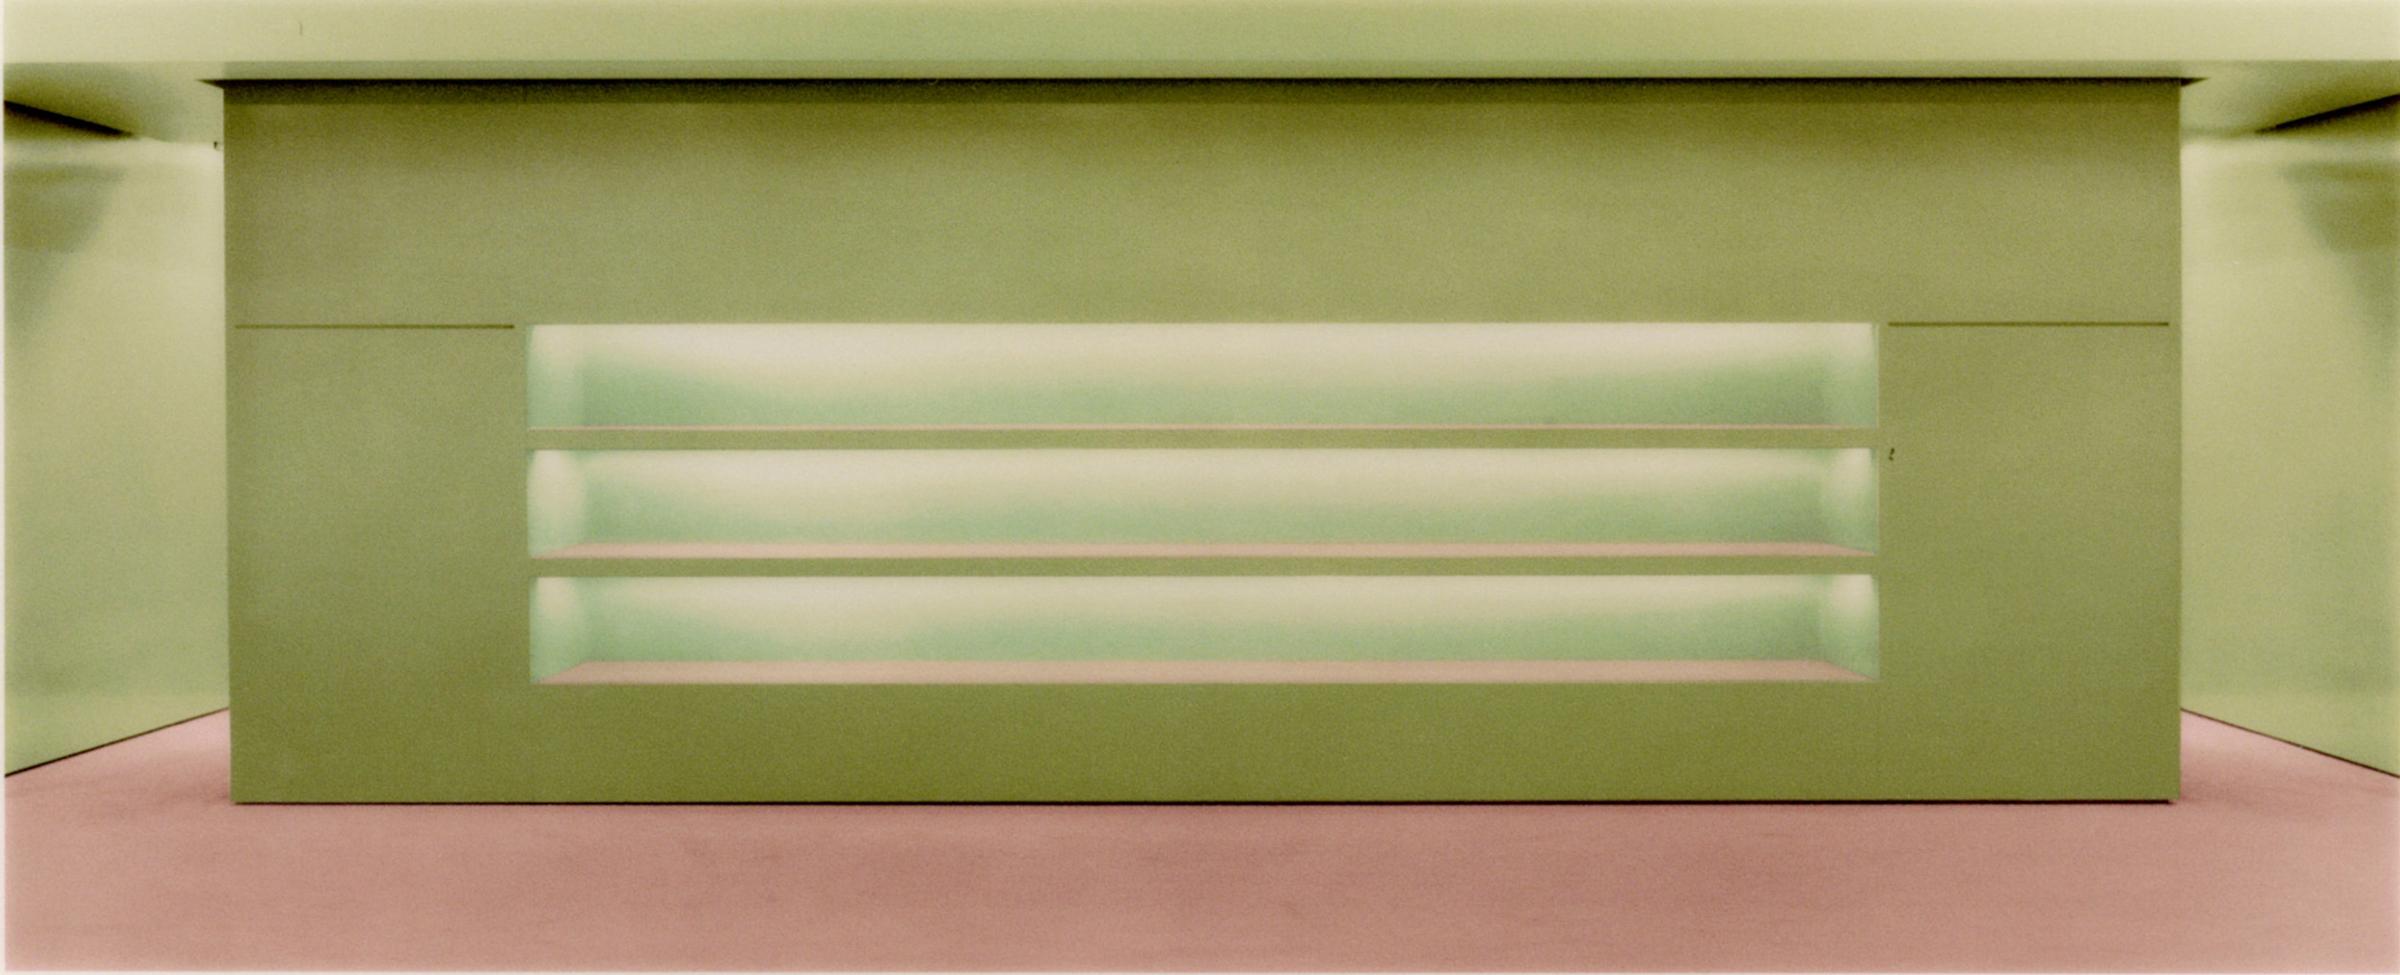 Andreas Gursky's  Prada II,  1996